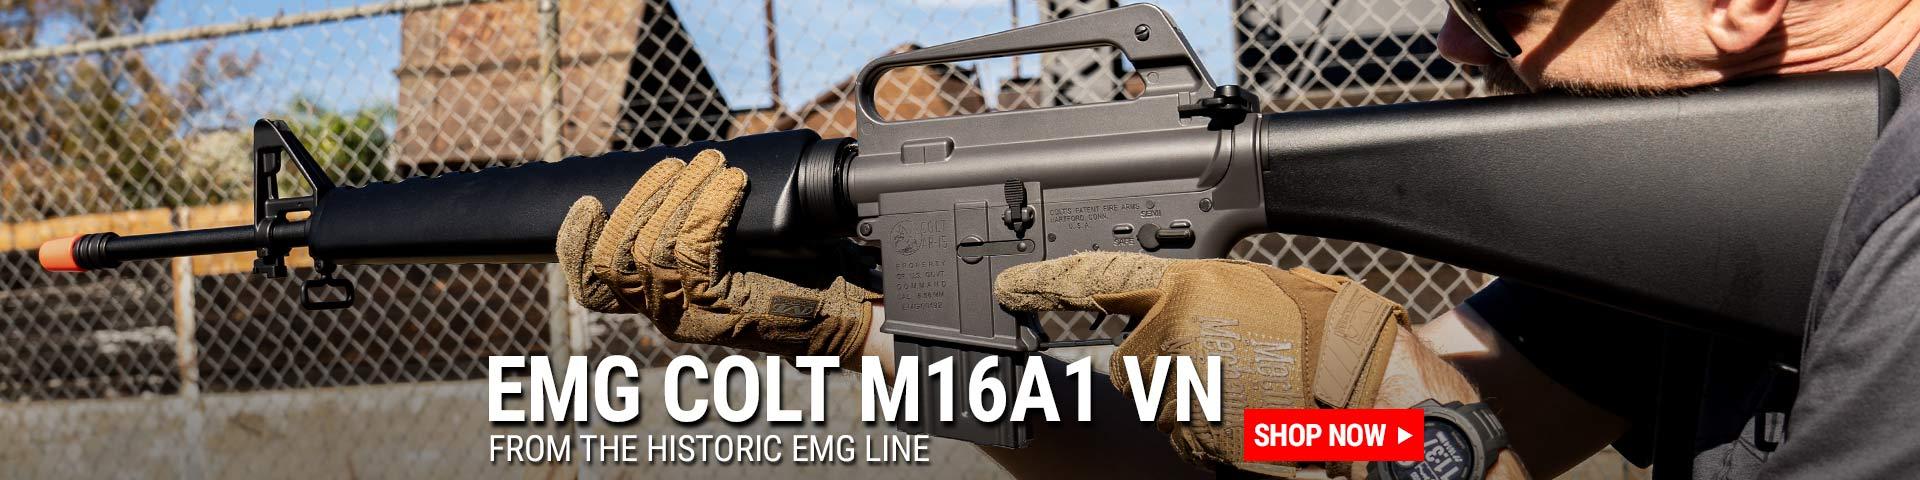 EMG M16A1 VN